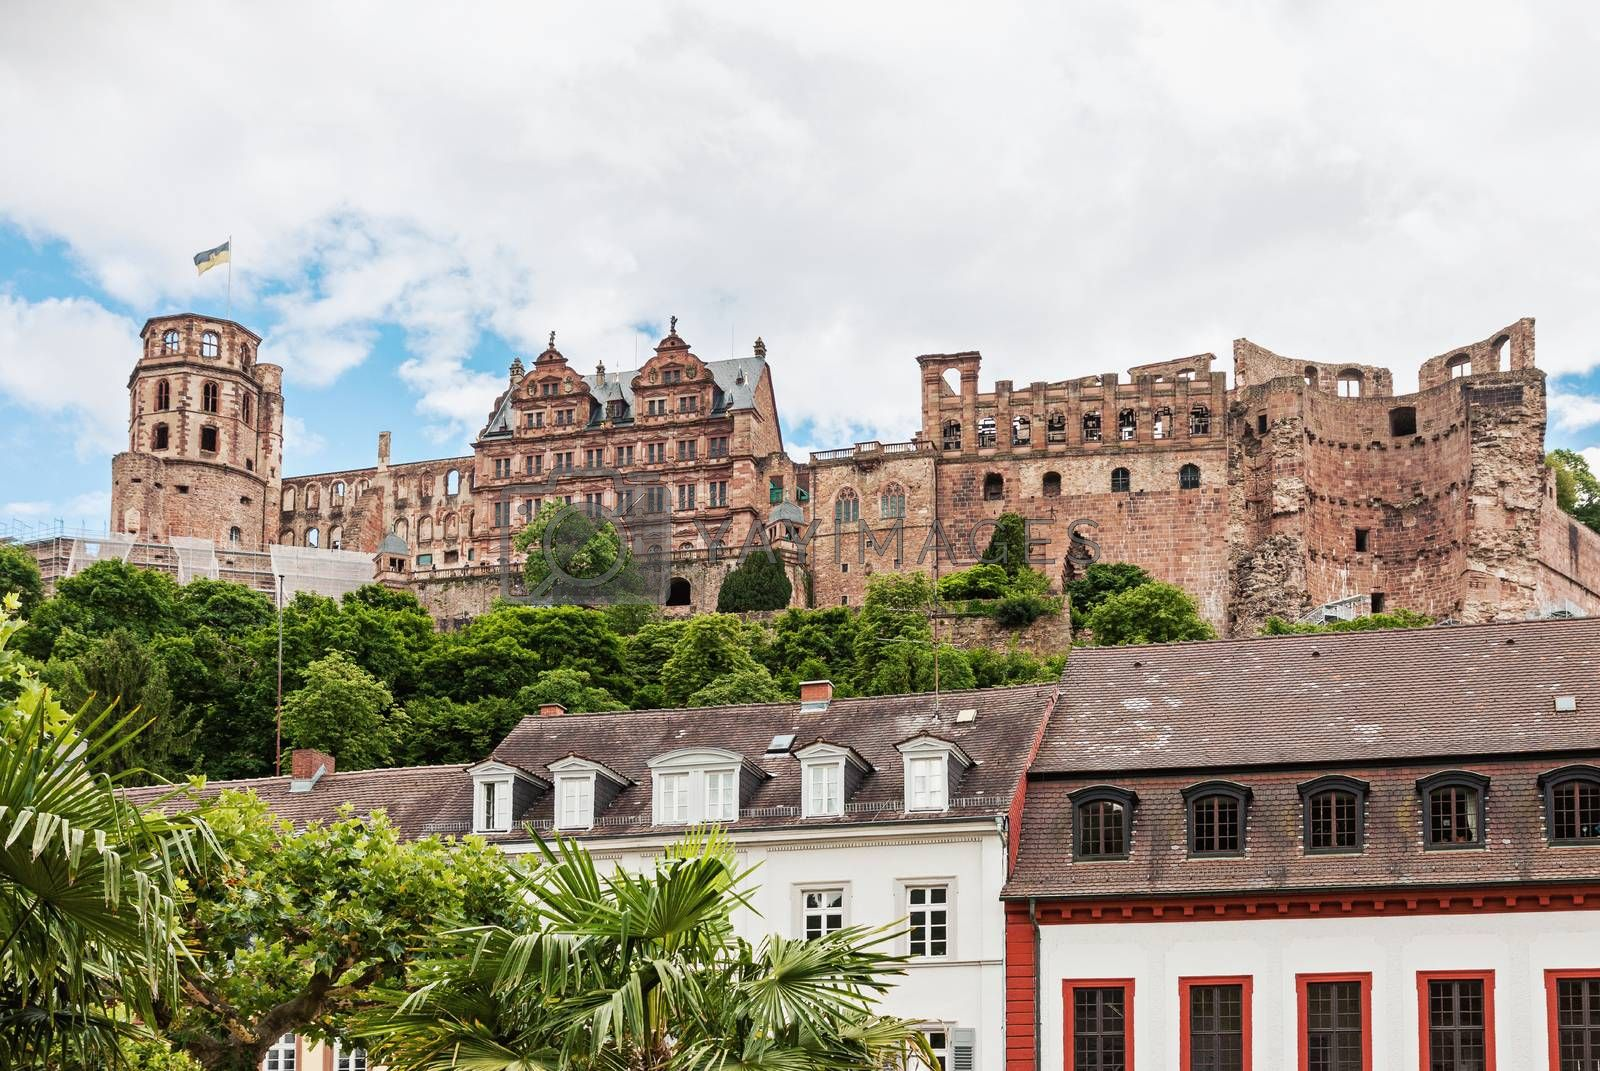 Heidelberg castle in Germany by Vaidas Bucys